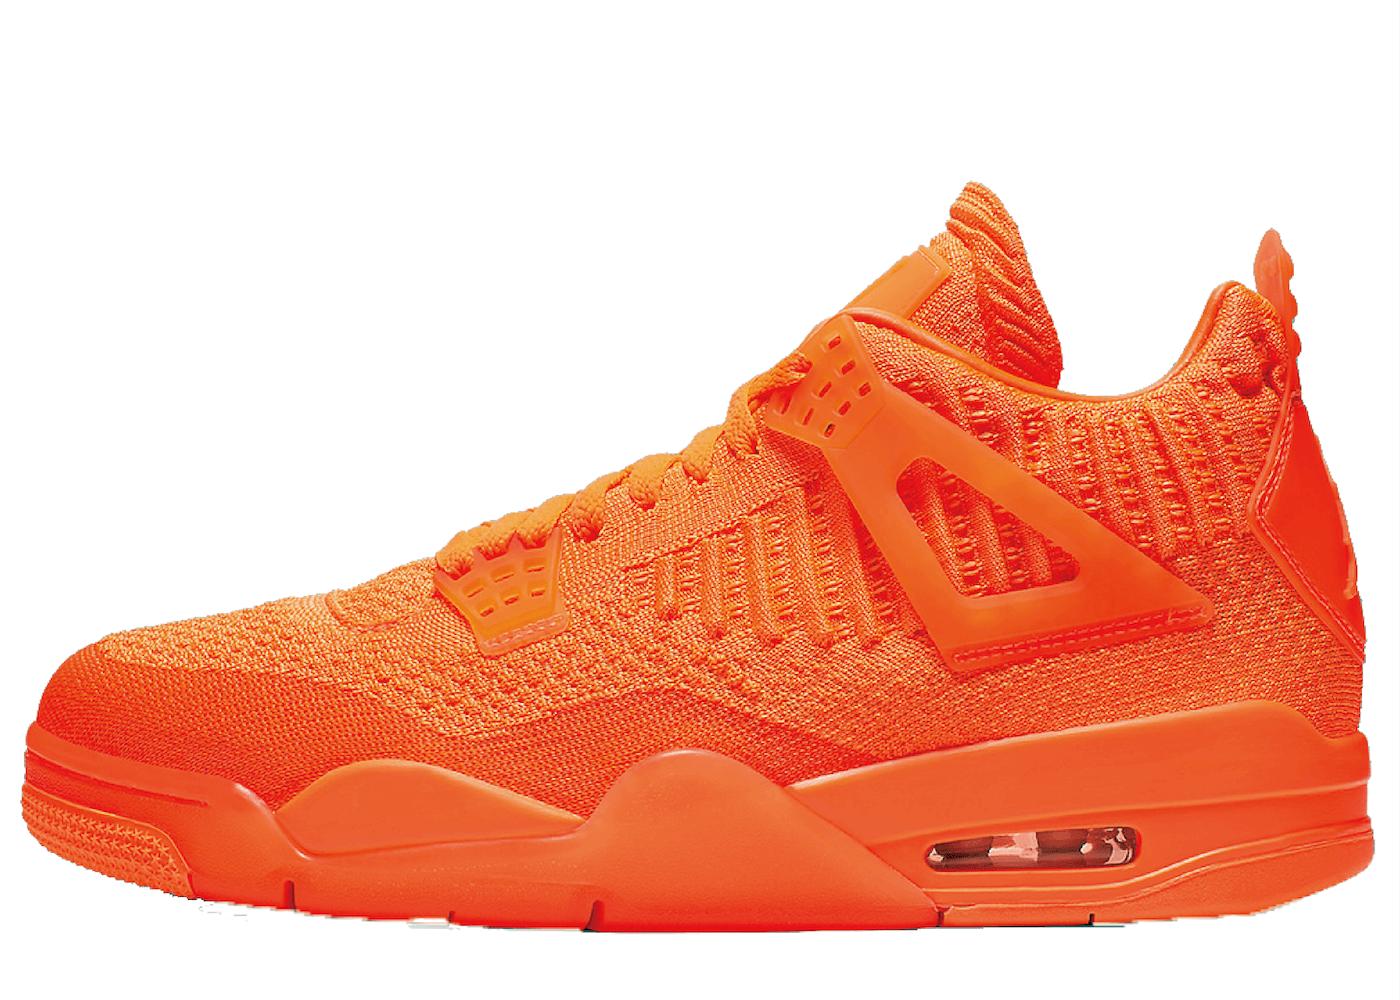 Nike Air Jordan 4 Retro Flyknit Orangeの写真